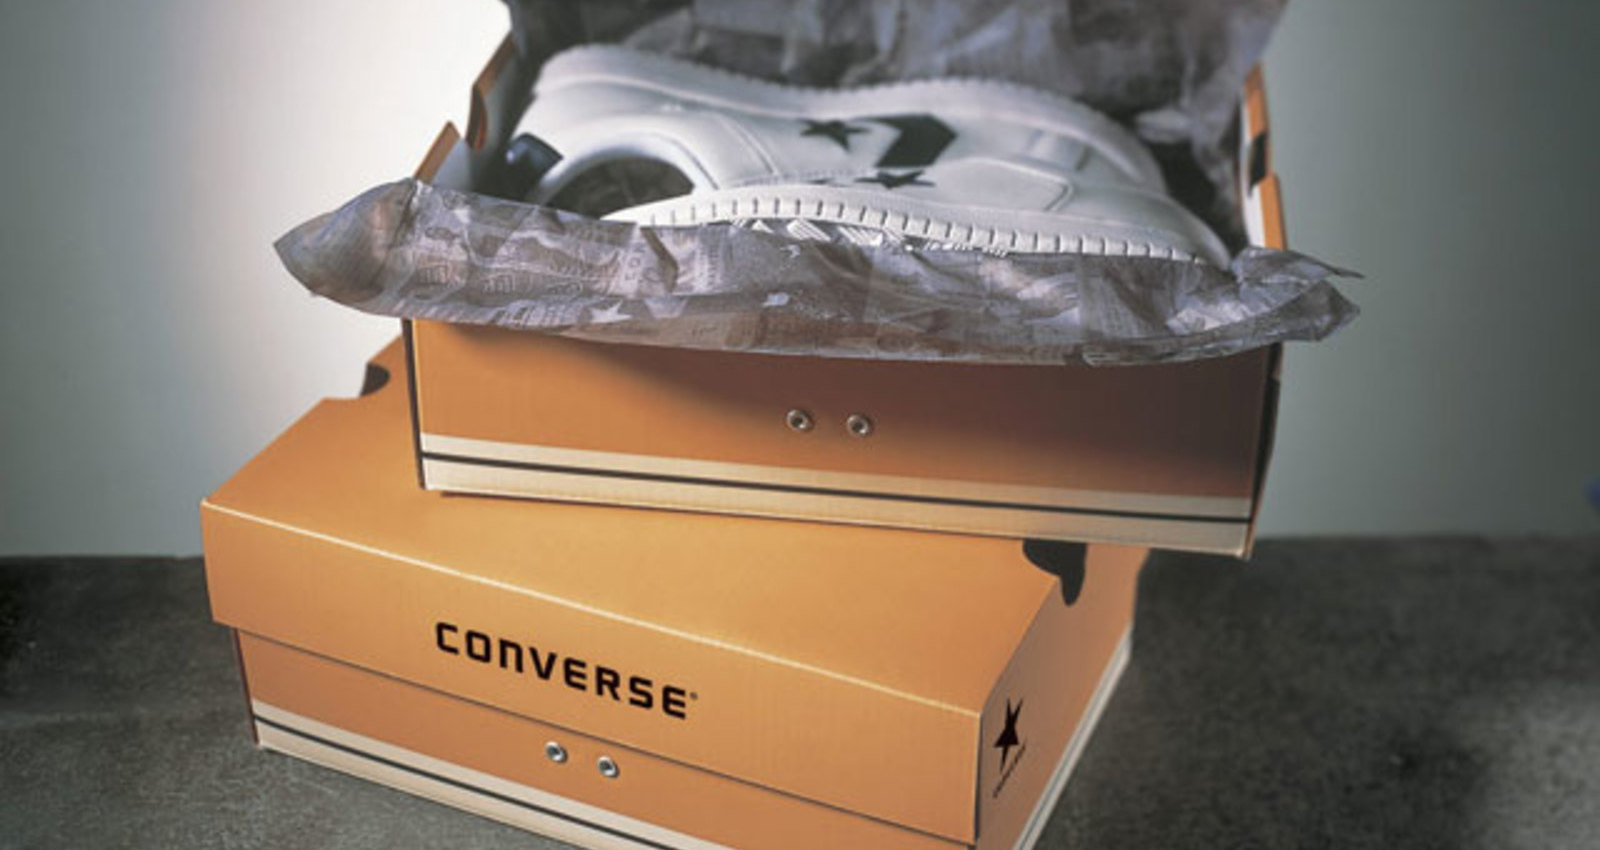 Converse Shoe Box - Black, Converse Shoe Box - Blue, Converse Shoe Box - Tan